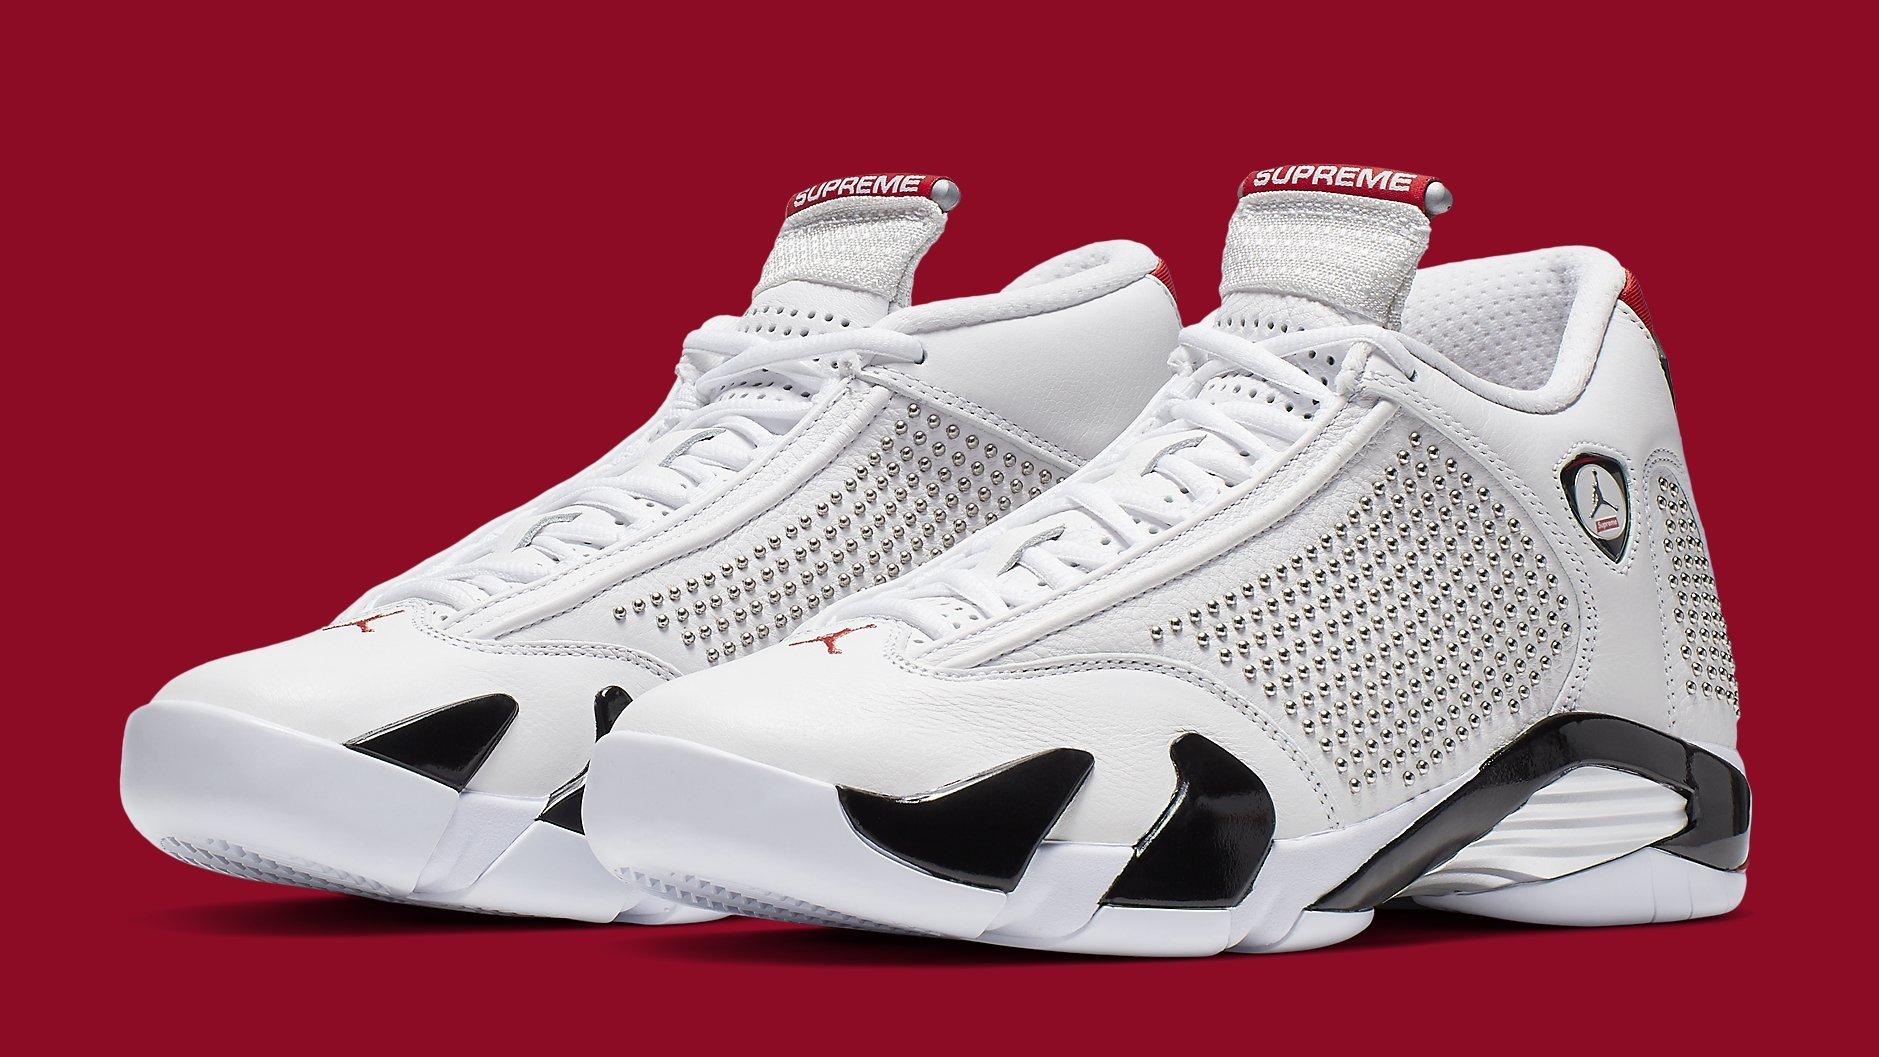 frecuencia nieve Optimismo  Supreme x Air Jordan 14 Release Date | Sole Collector